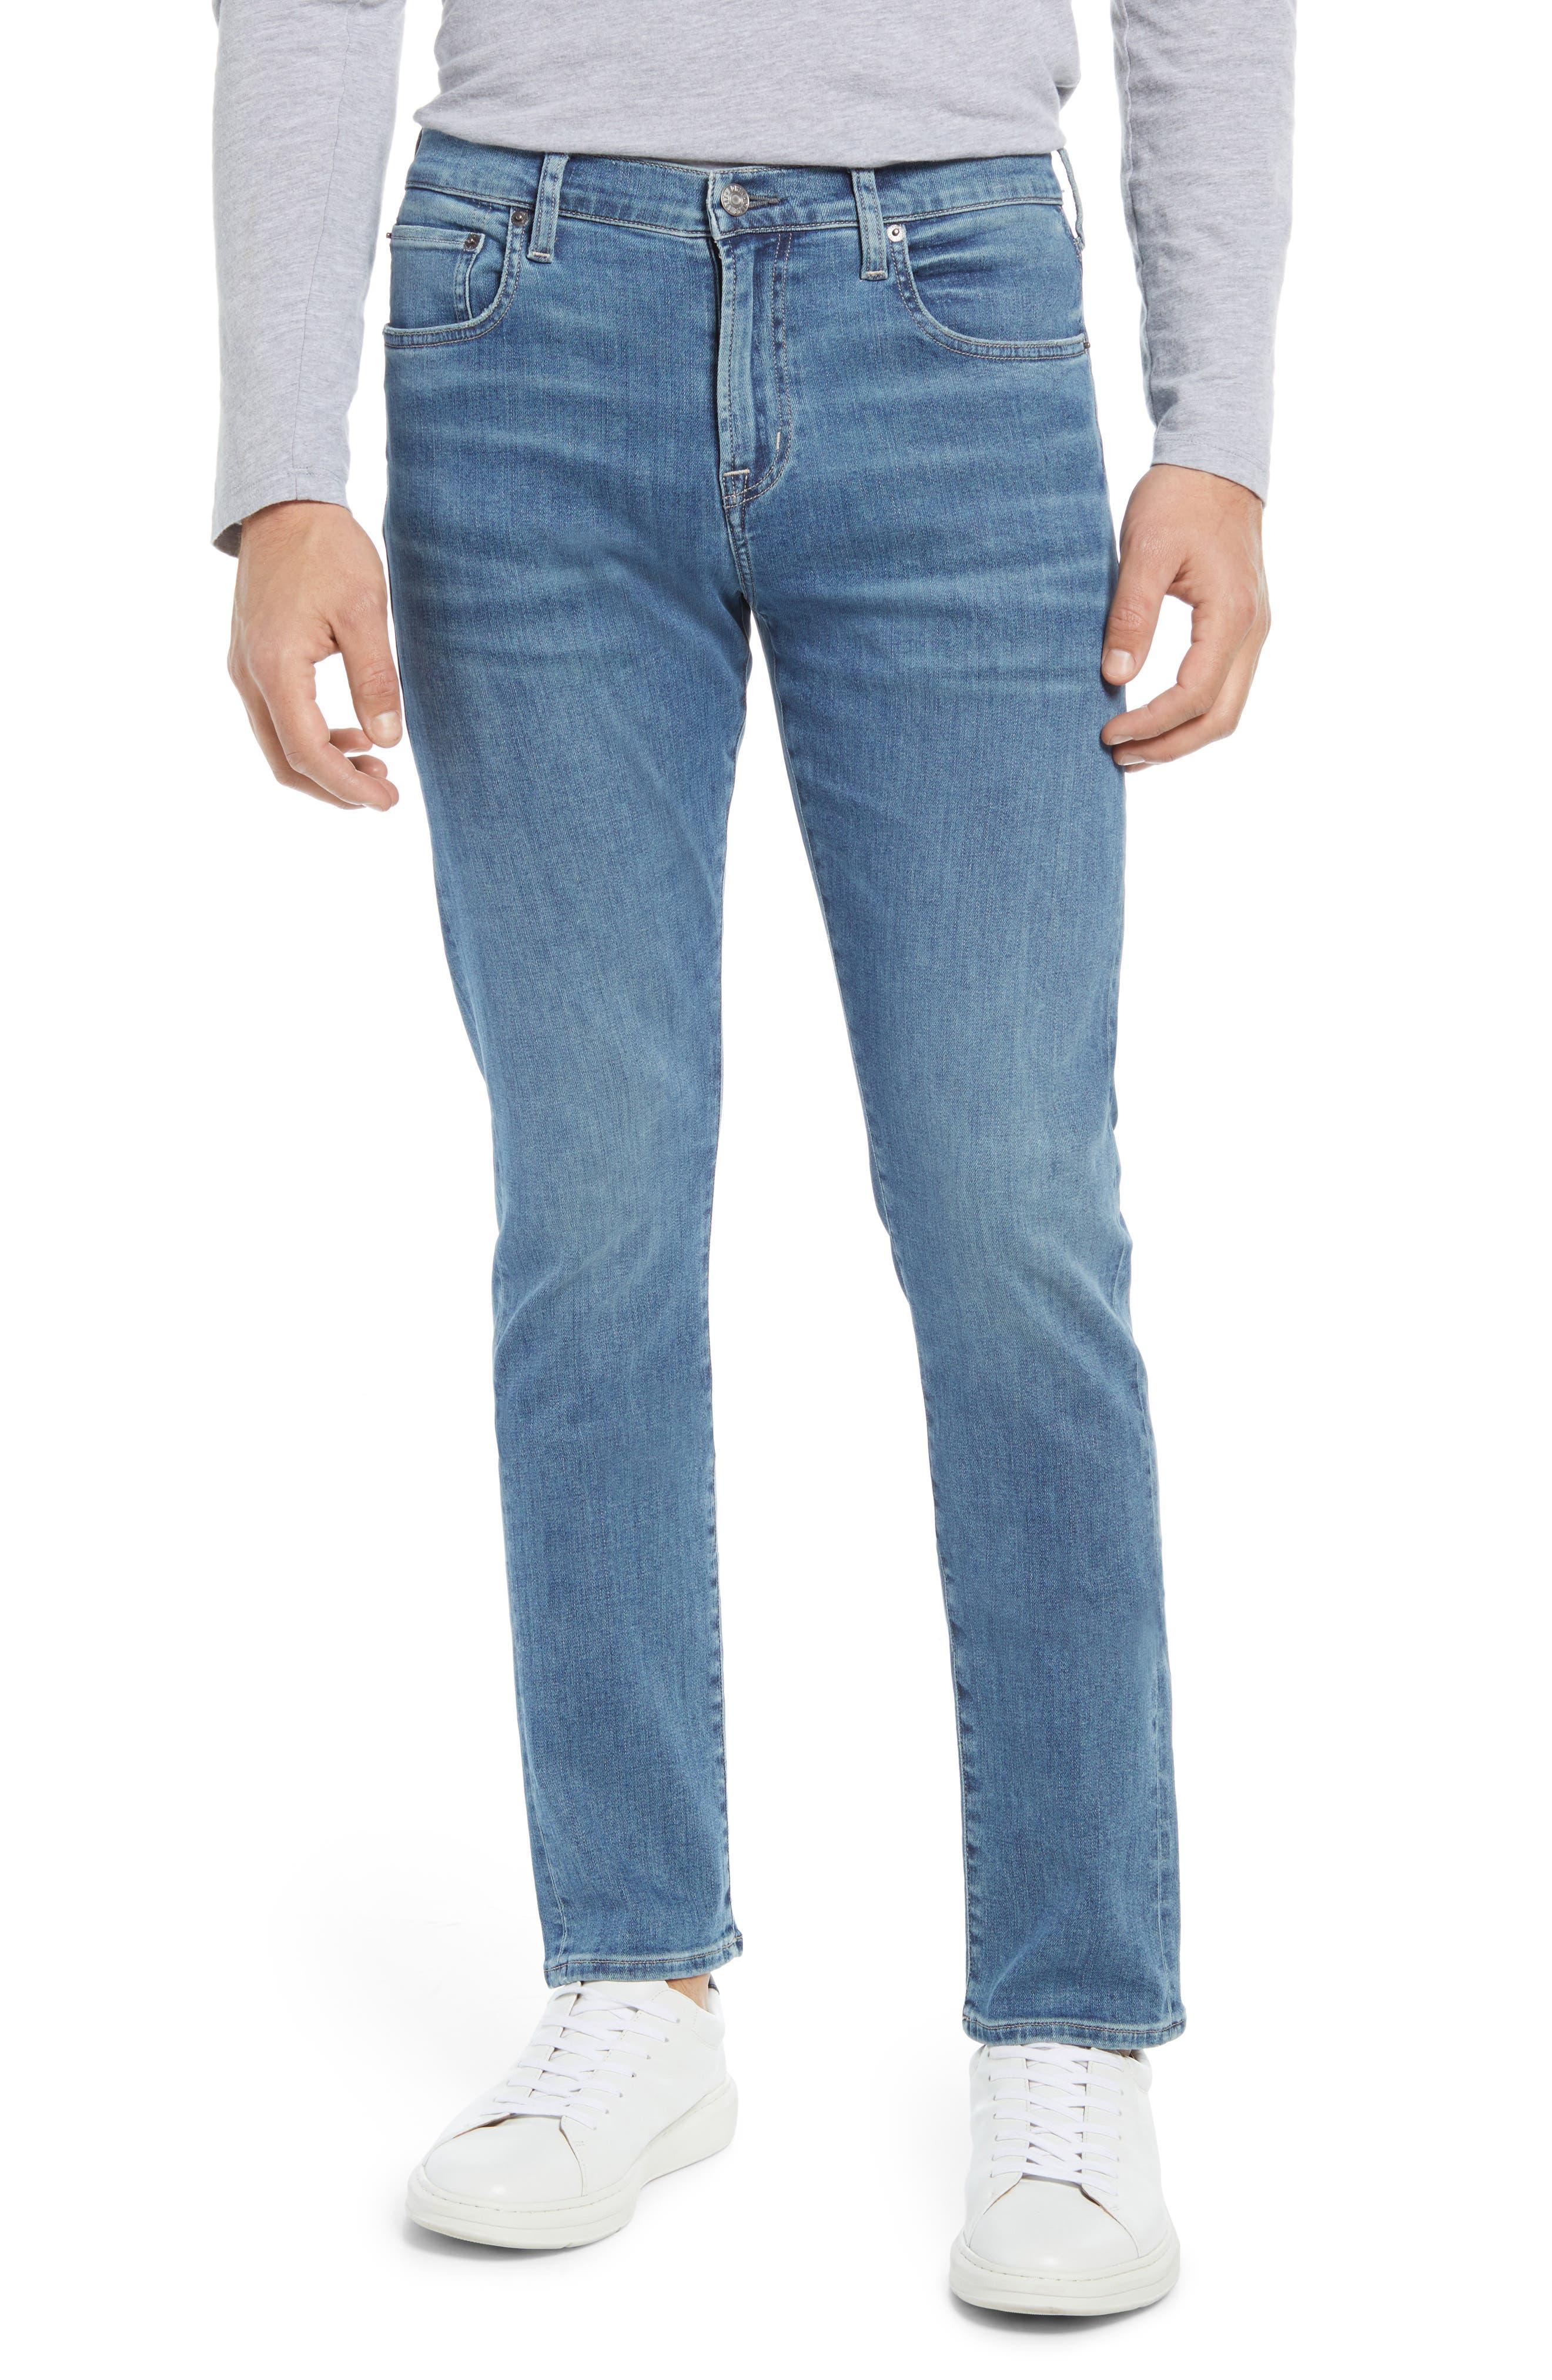 Maddox Slim Fit Stretch Jeans